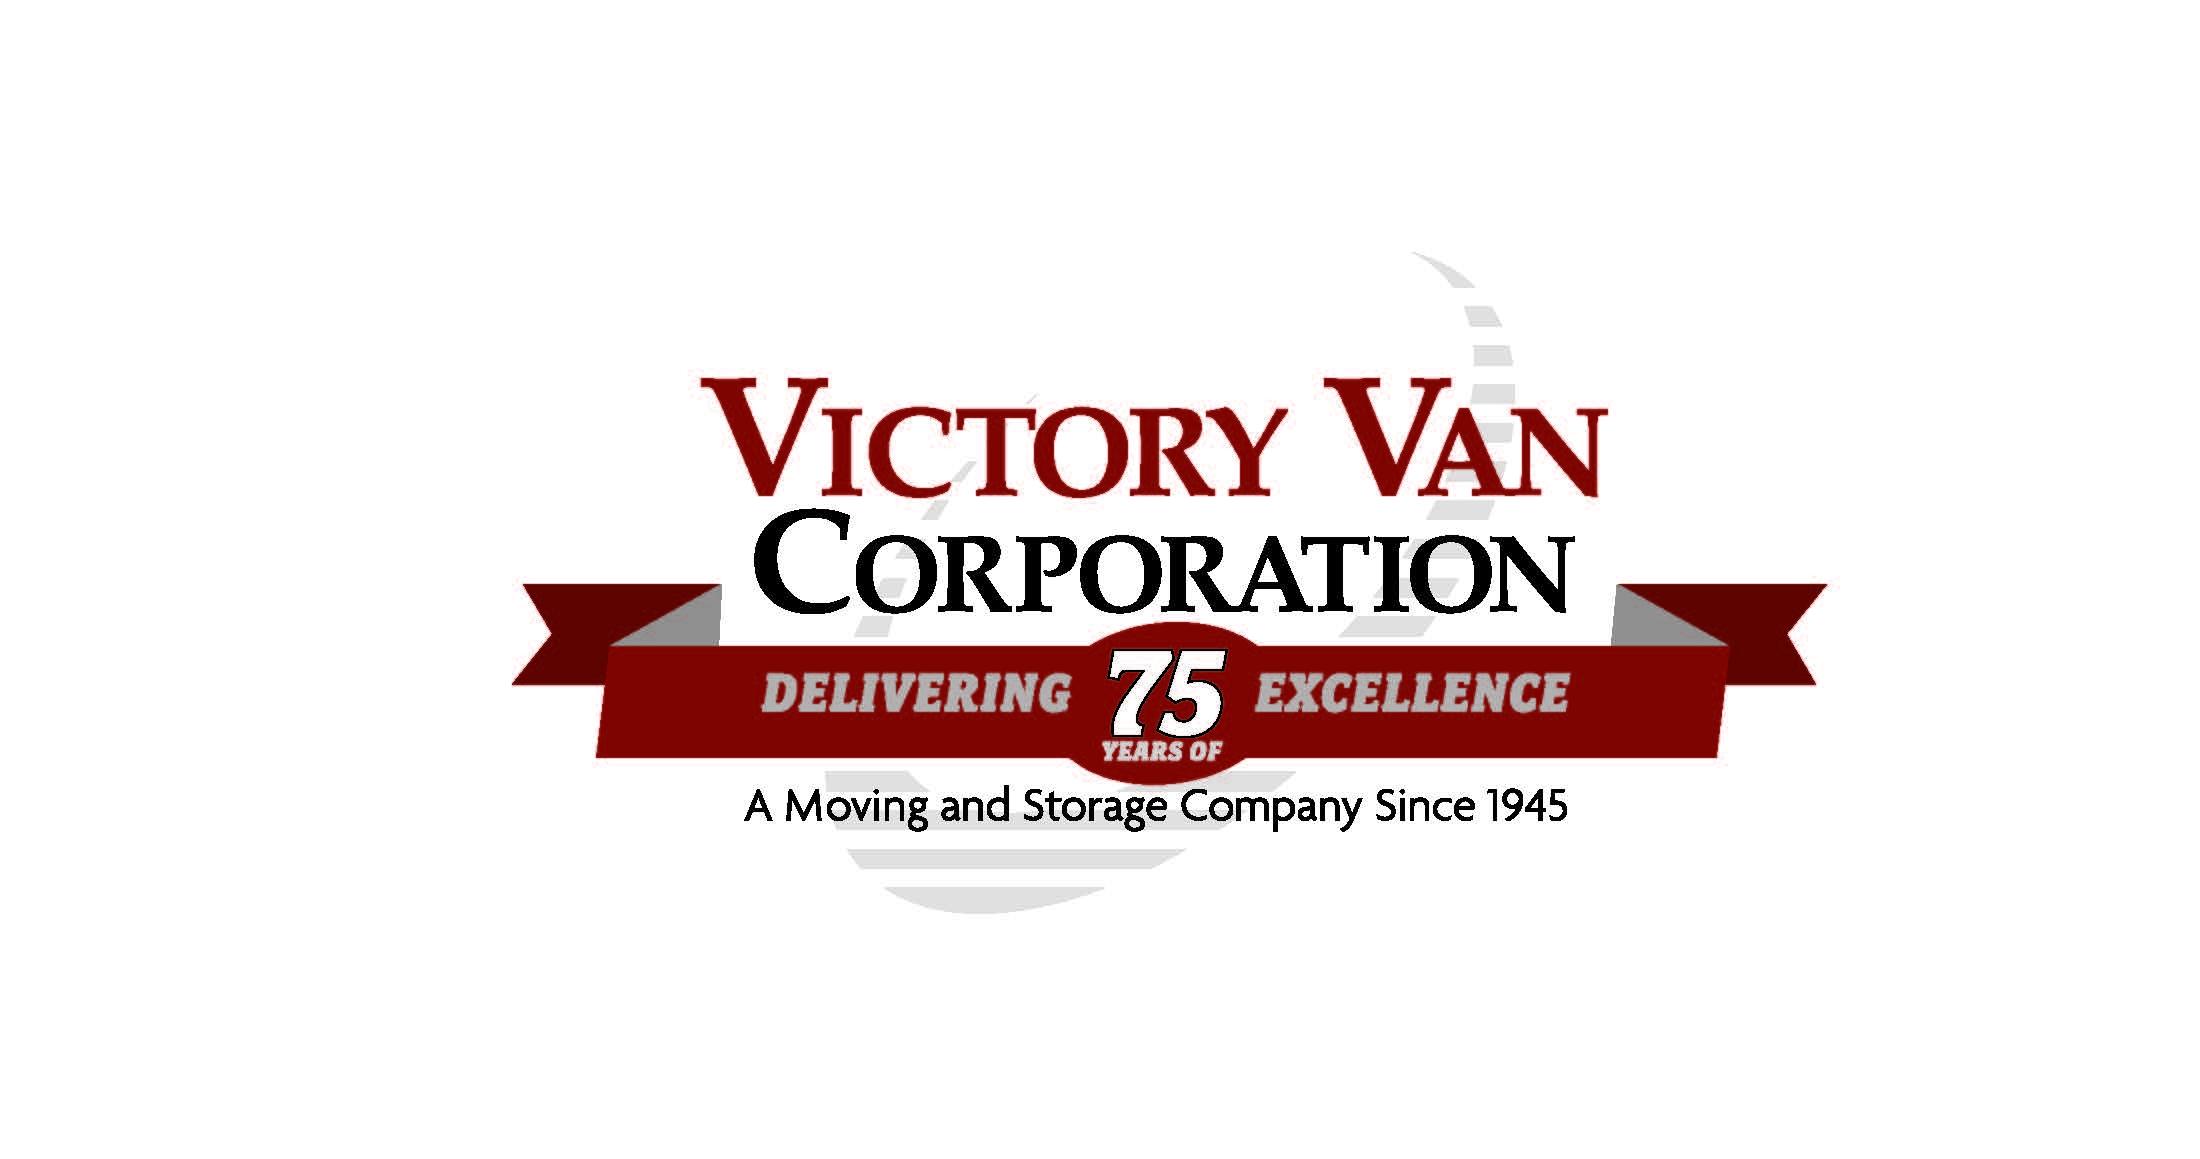 Celebrating Victory Van's 75th Anniversary